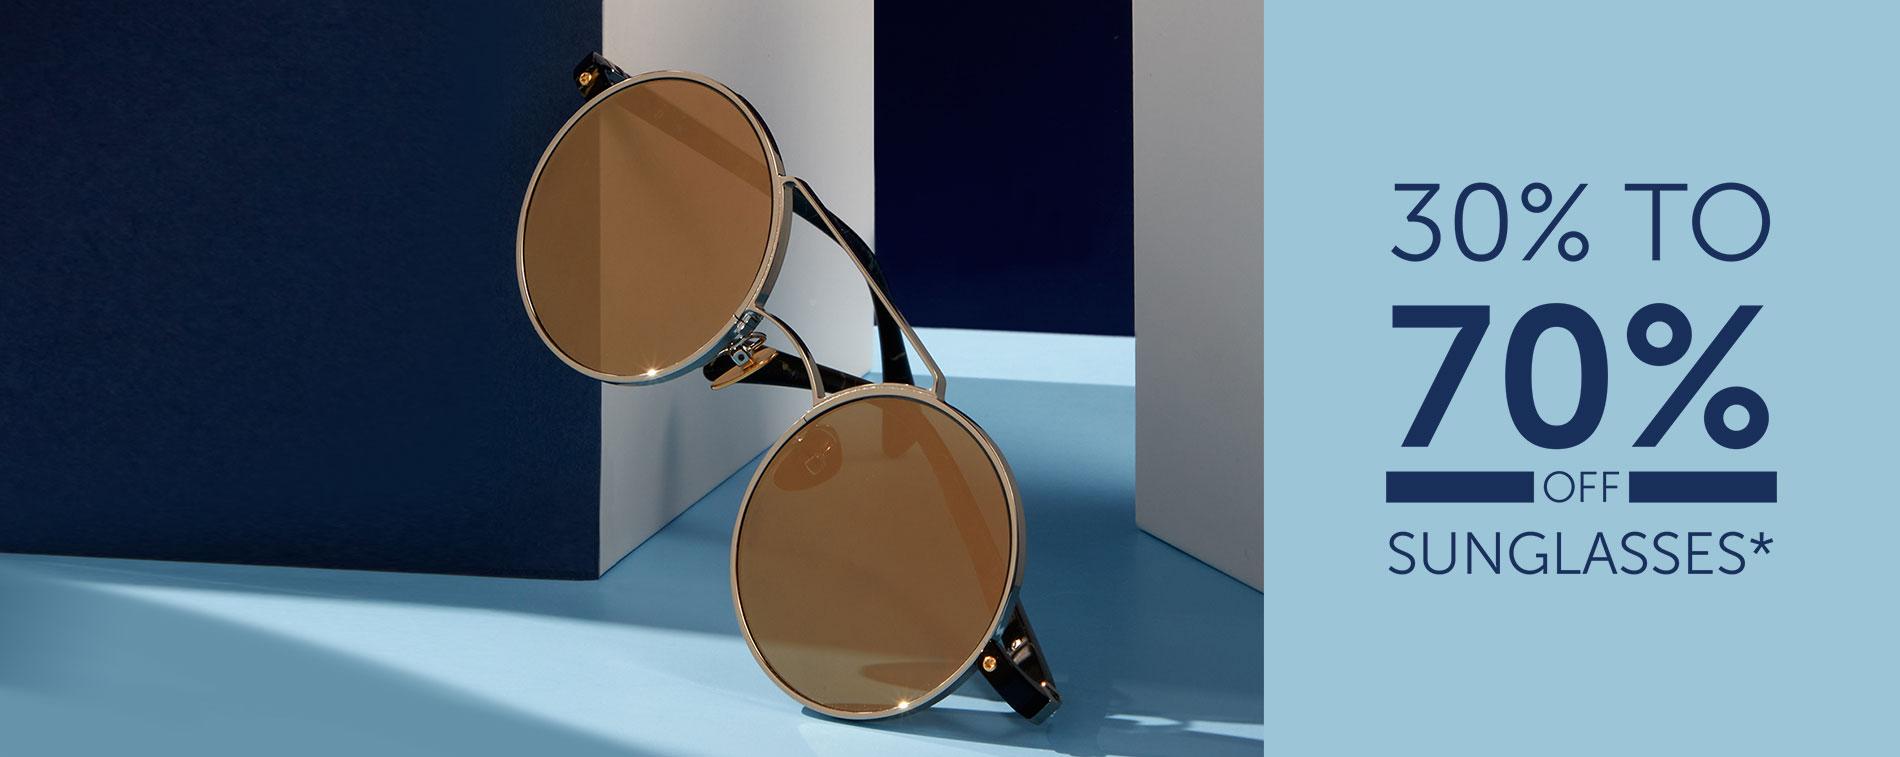 EN-CAT-1-Sunglasses-70